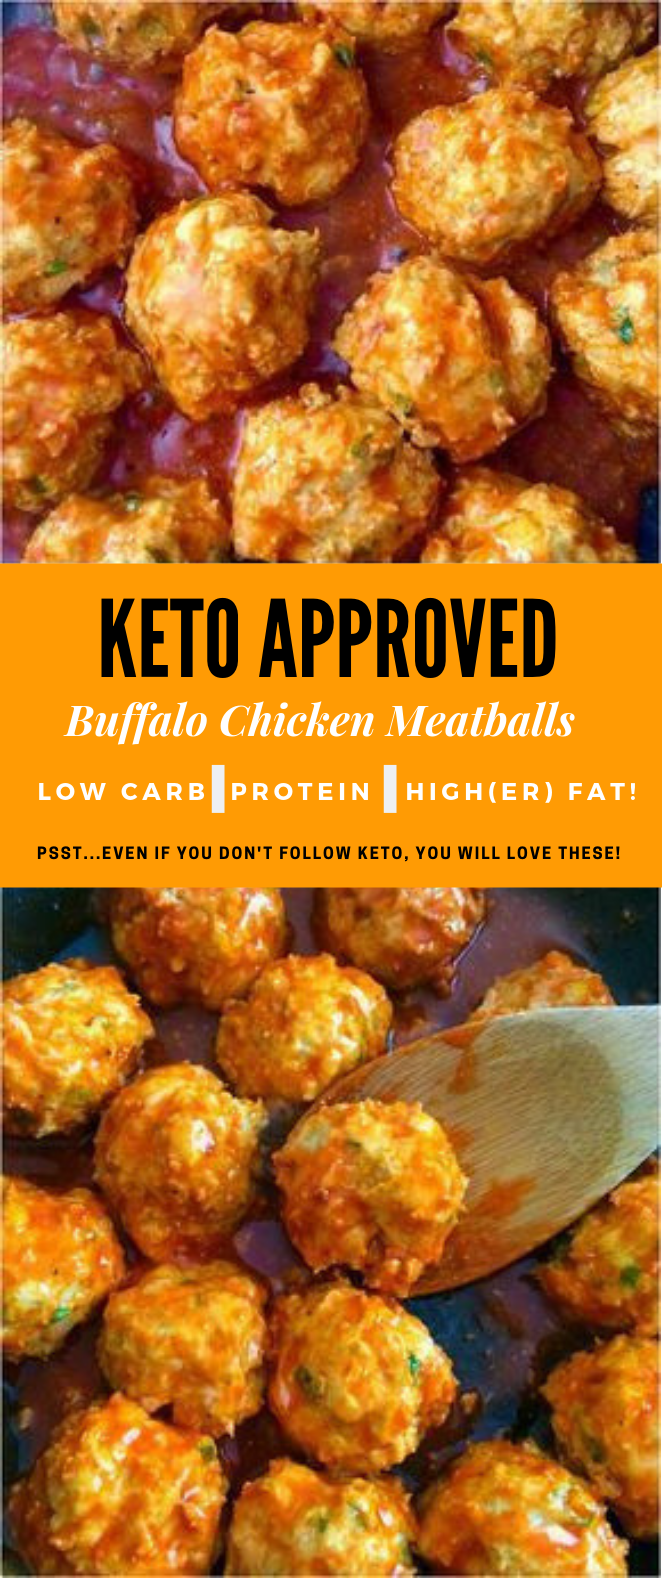 BUFFALO CHICKEN MEATBALLS- KETO APPROVED #keto #meatballs